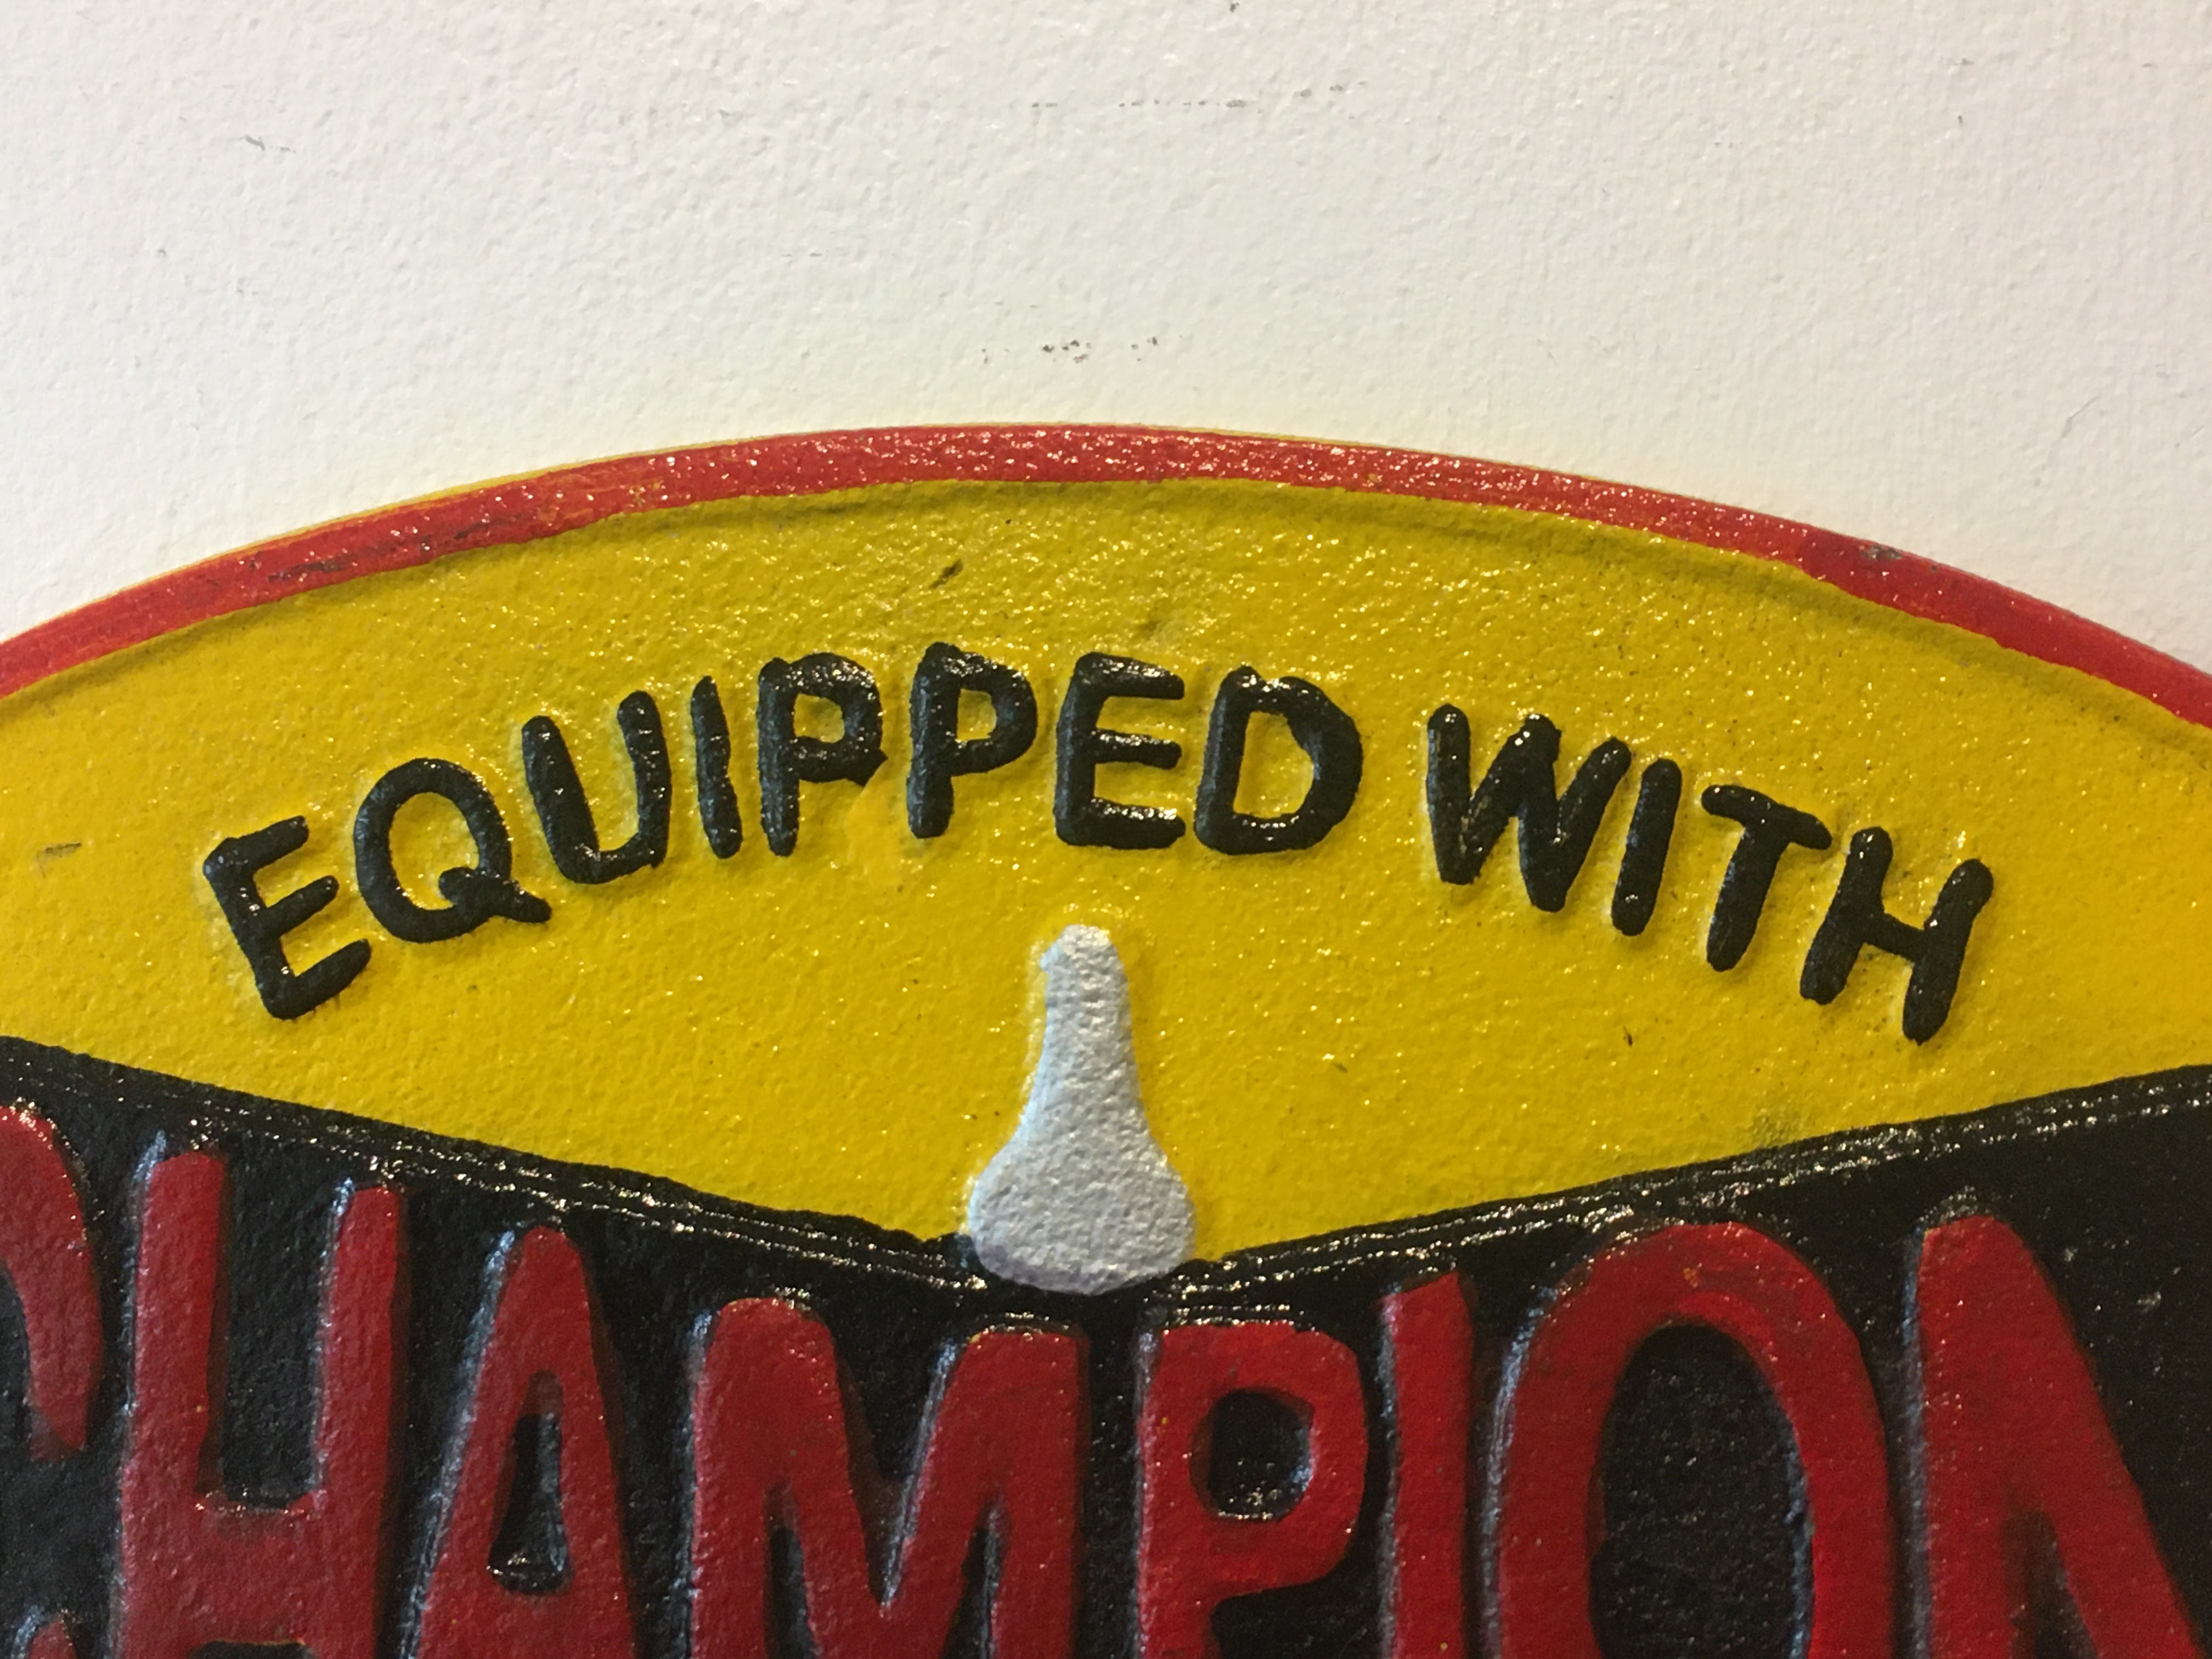 Champion 'Spark Plugs' Cast Iron Sign - Image 2 of 6